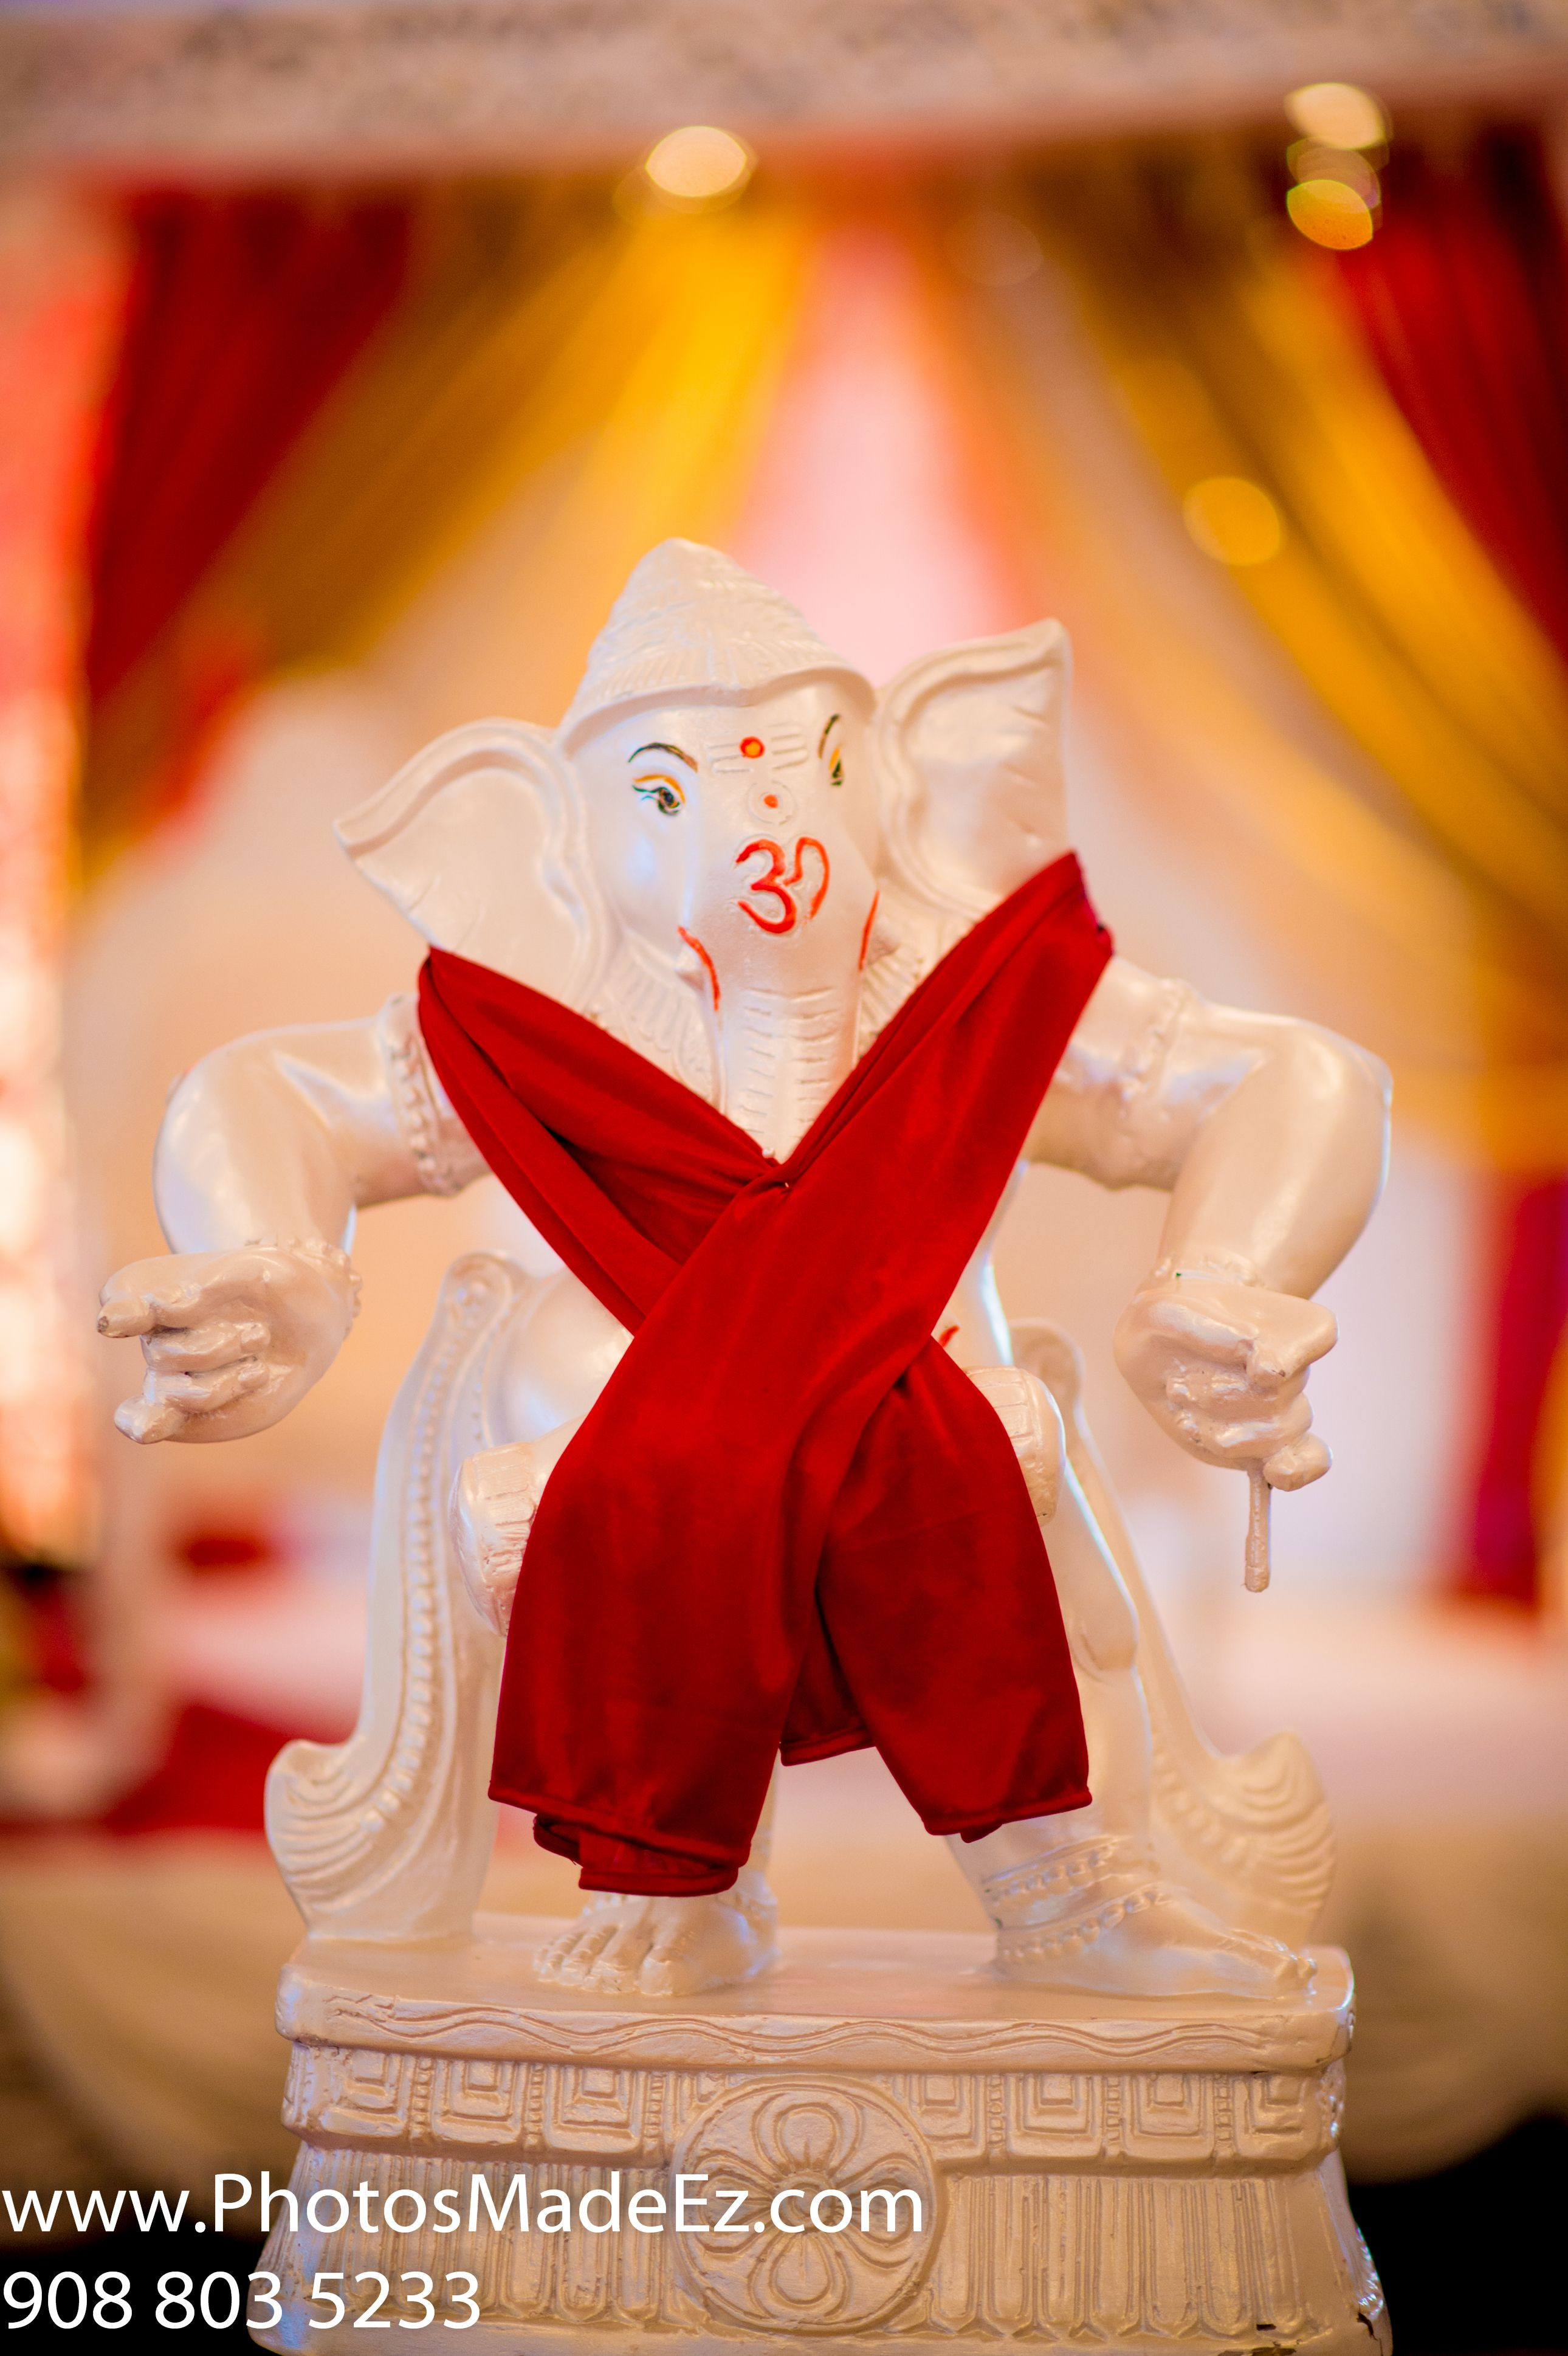 Ganesh in Gujarati Wedding Ceremony in Hilton, Stamford, CT with ...